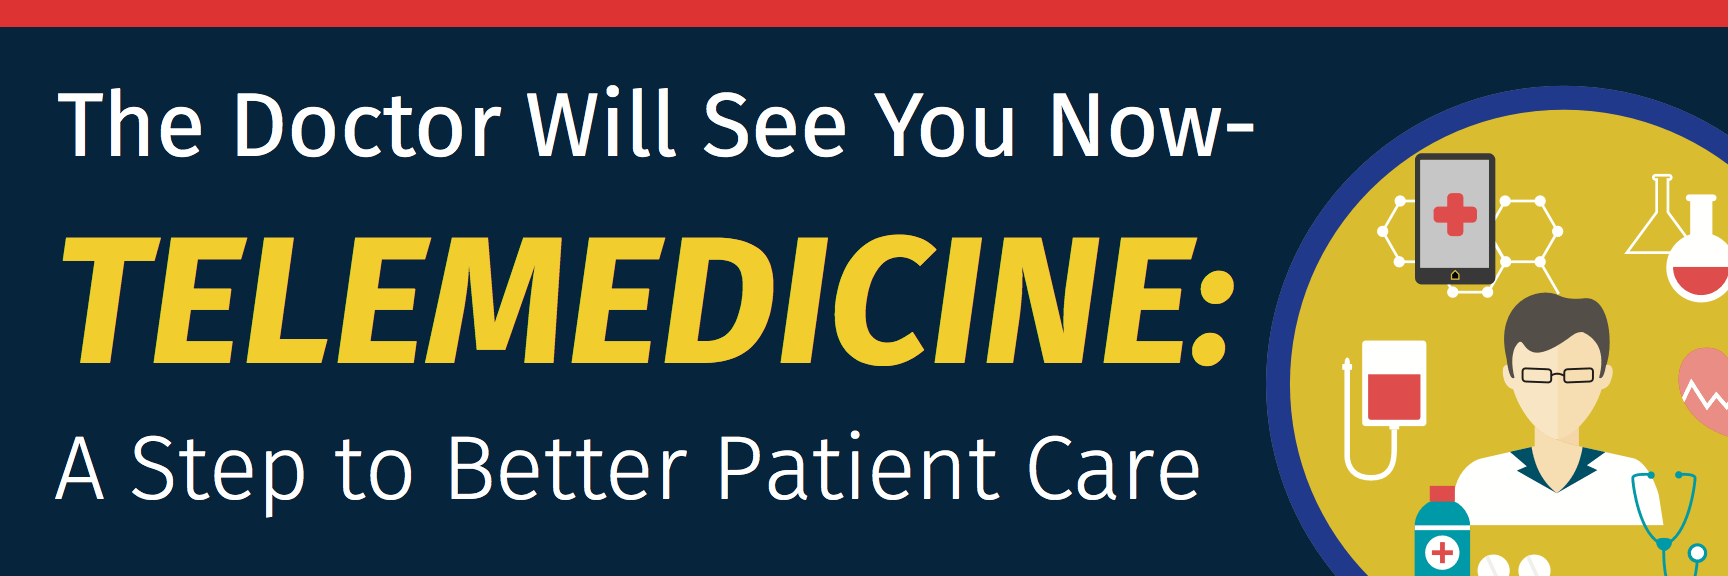 telemedicine banner image